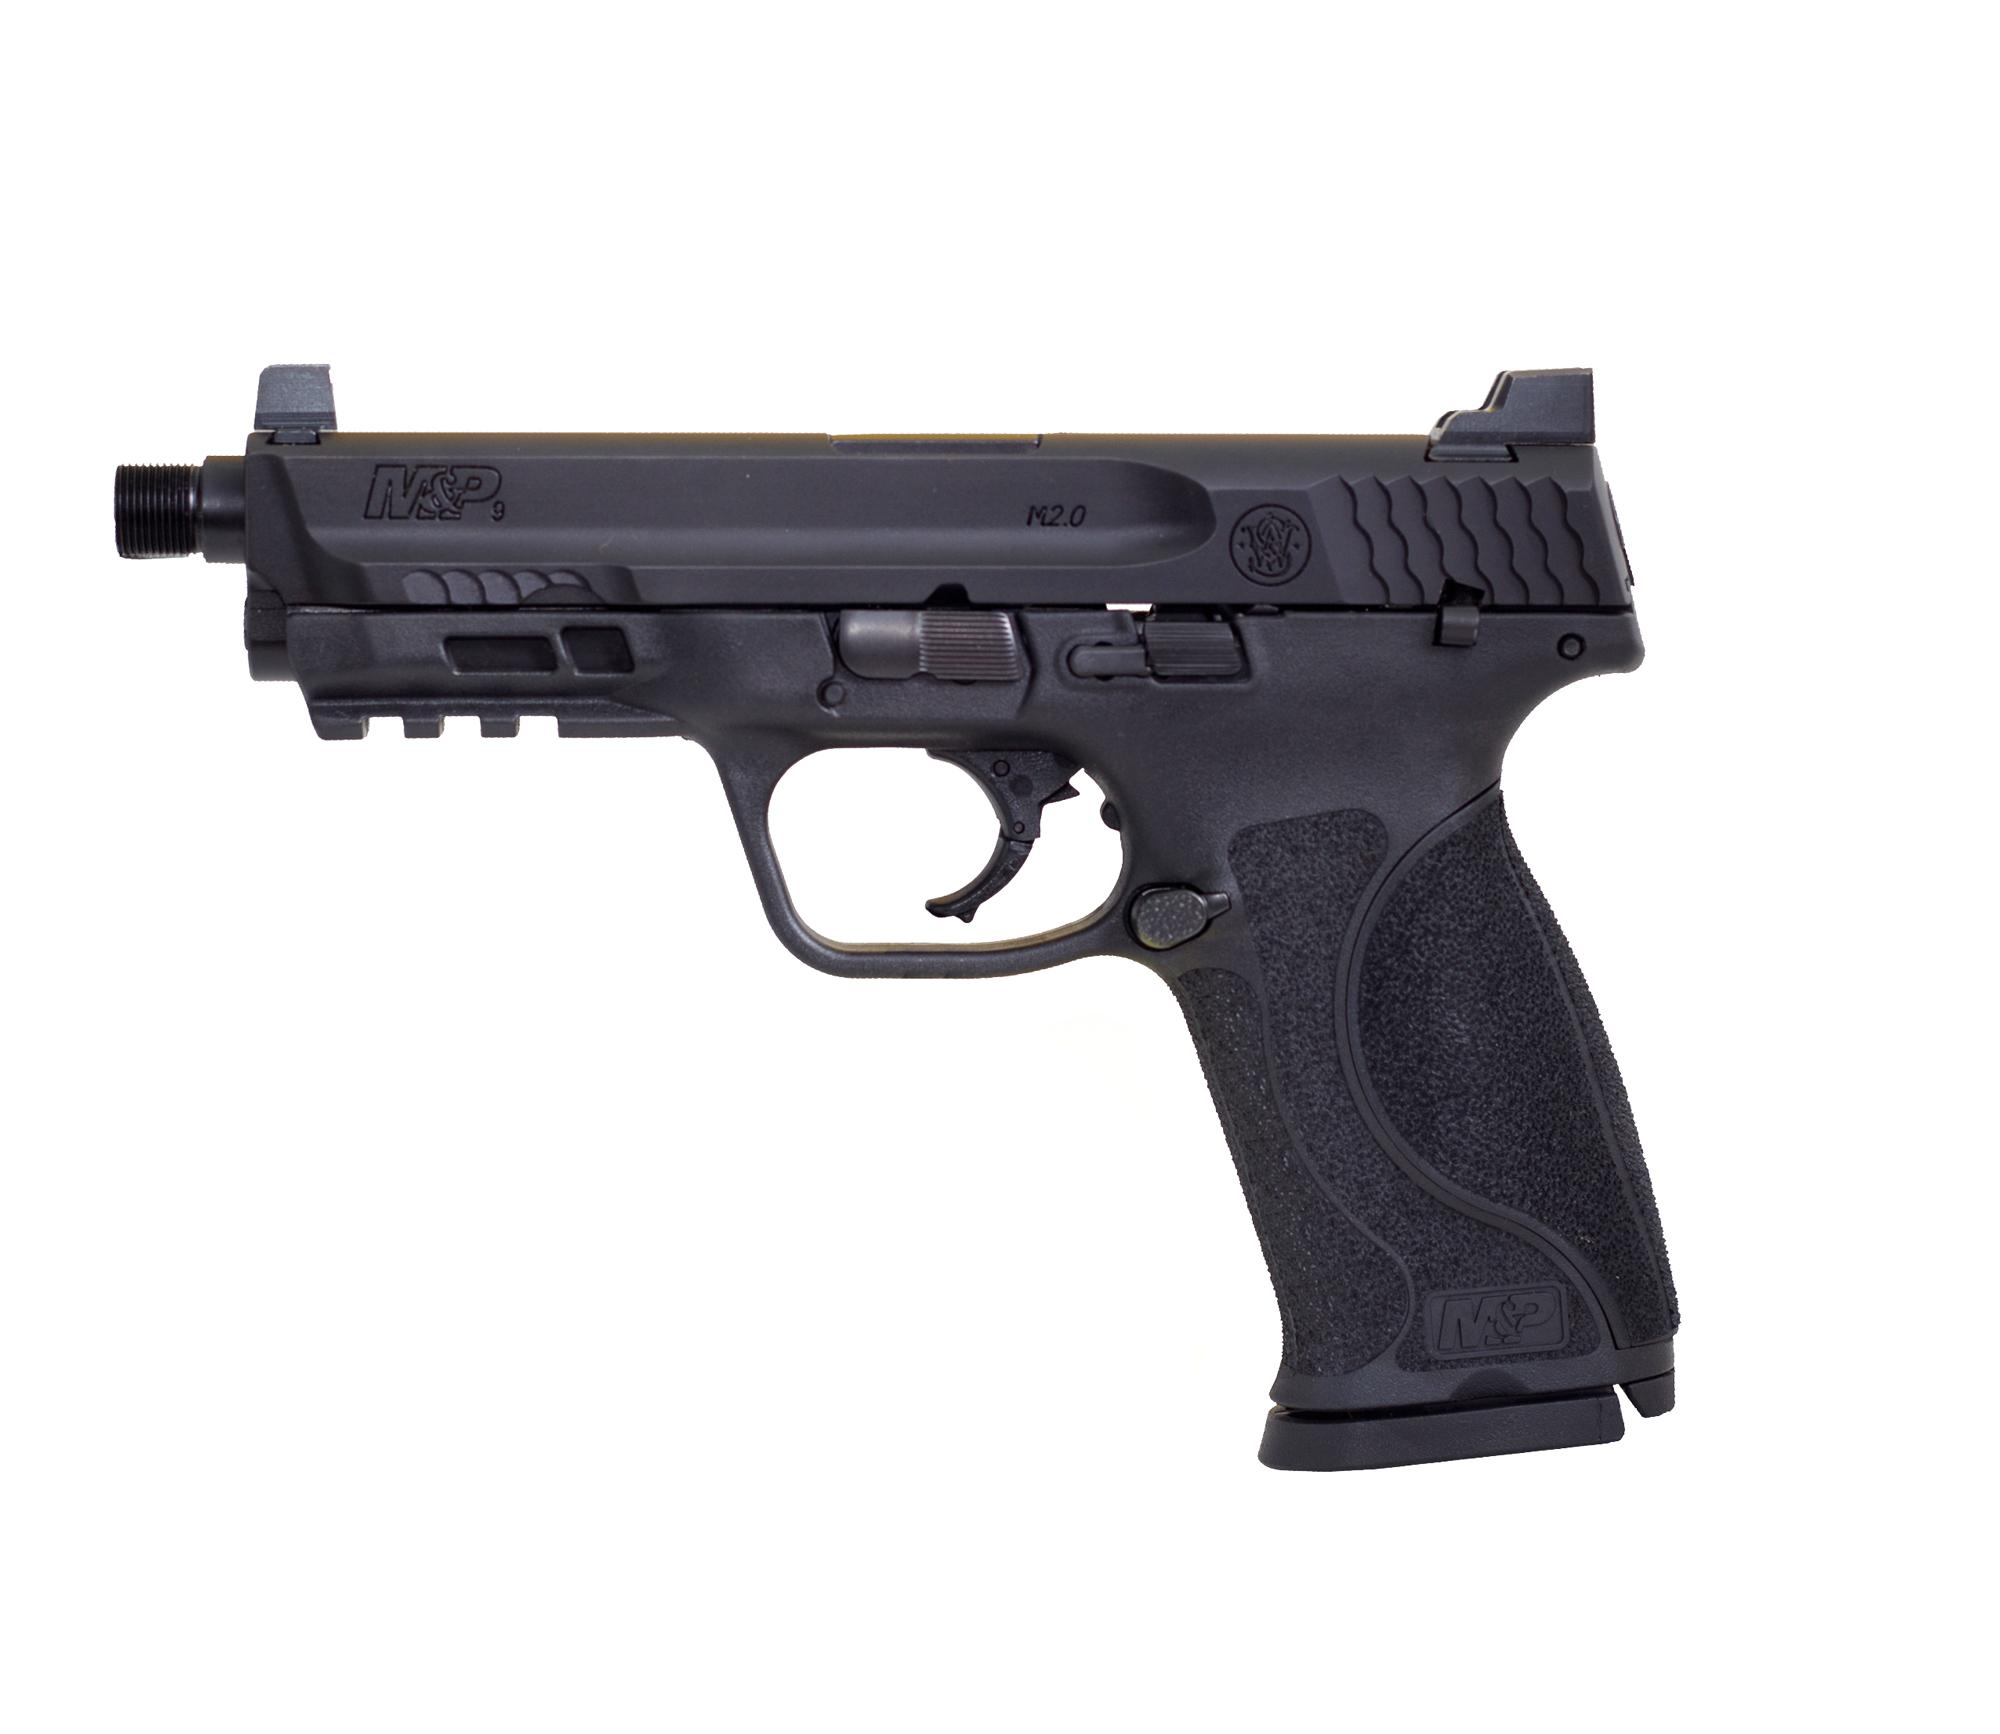 HUSH PUPPY MP9 2.0 9MM TB SLD - SLIDE LOCK DEVICE | 17+1